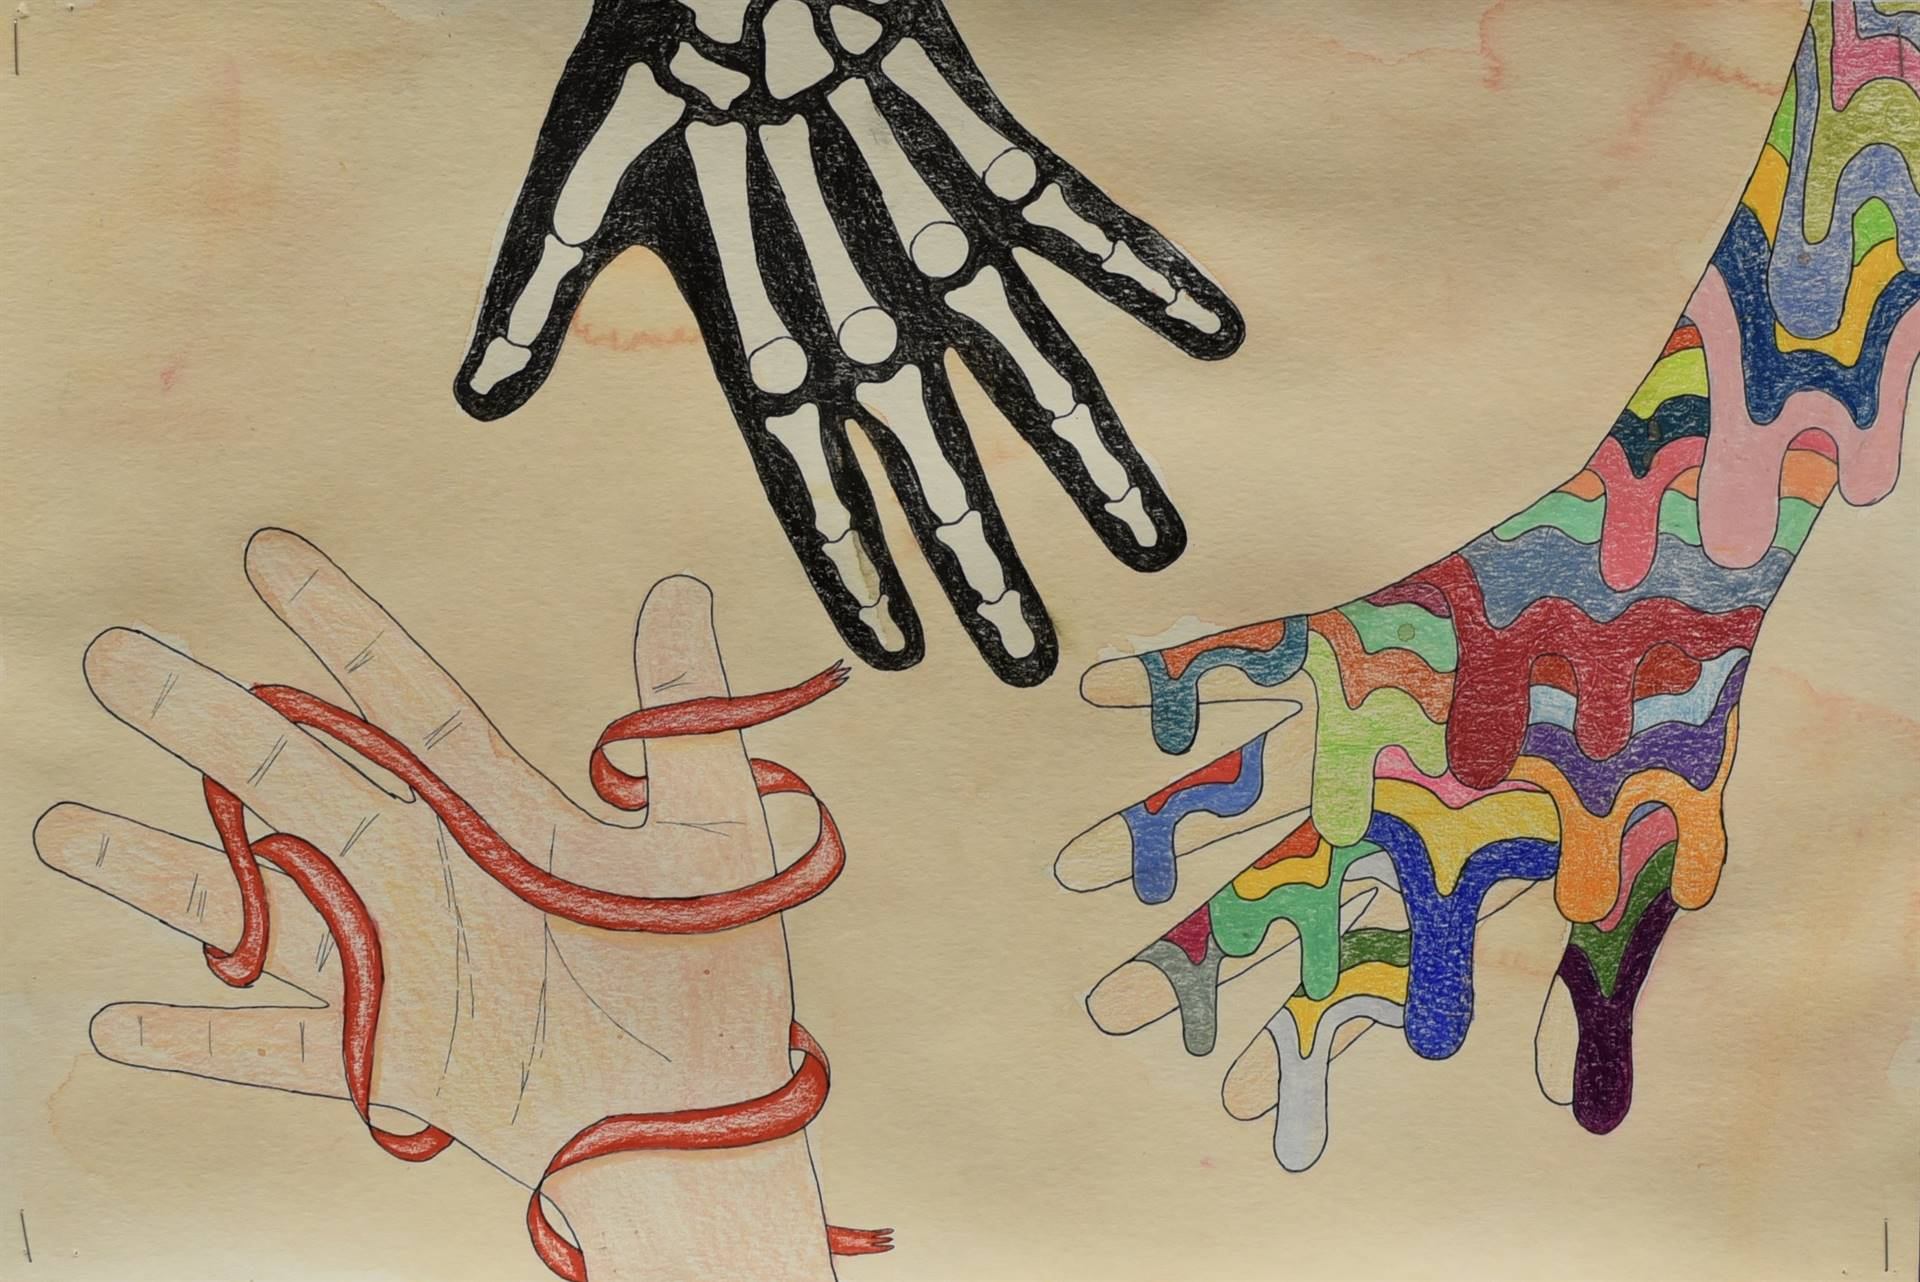 Brecksville-Broadview Hts. Middle School Art Projects 51